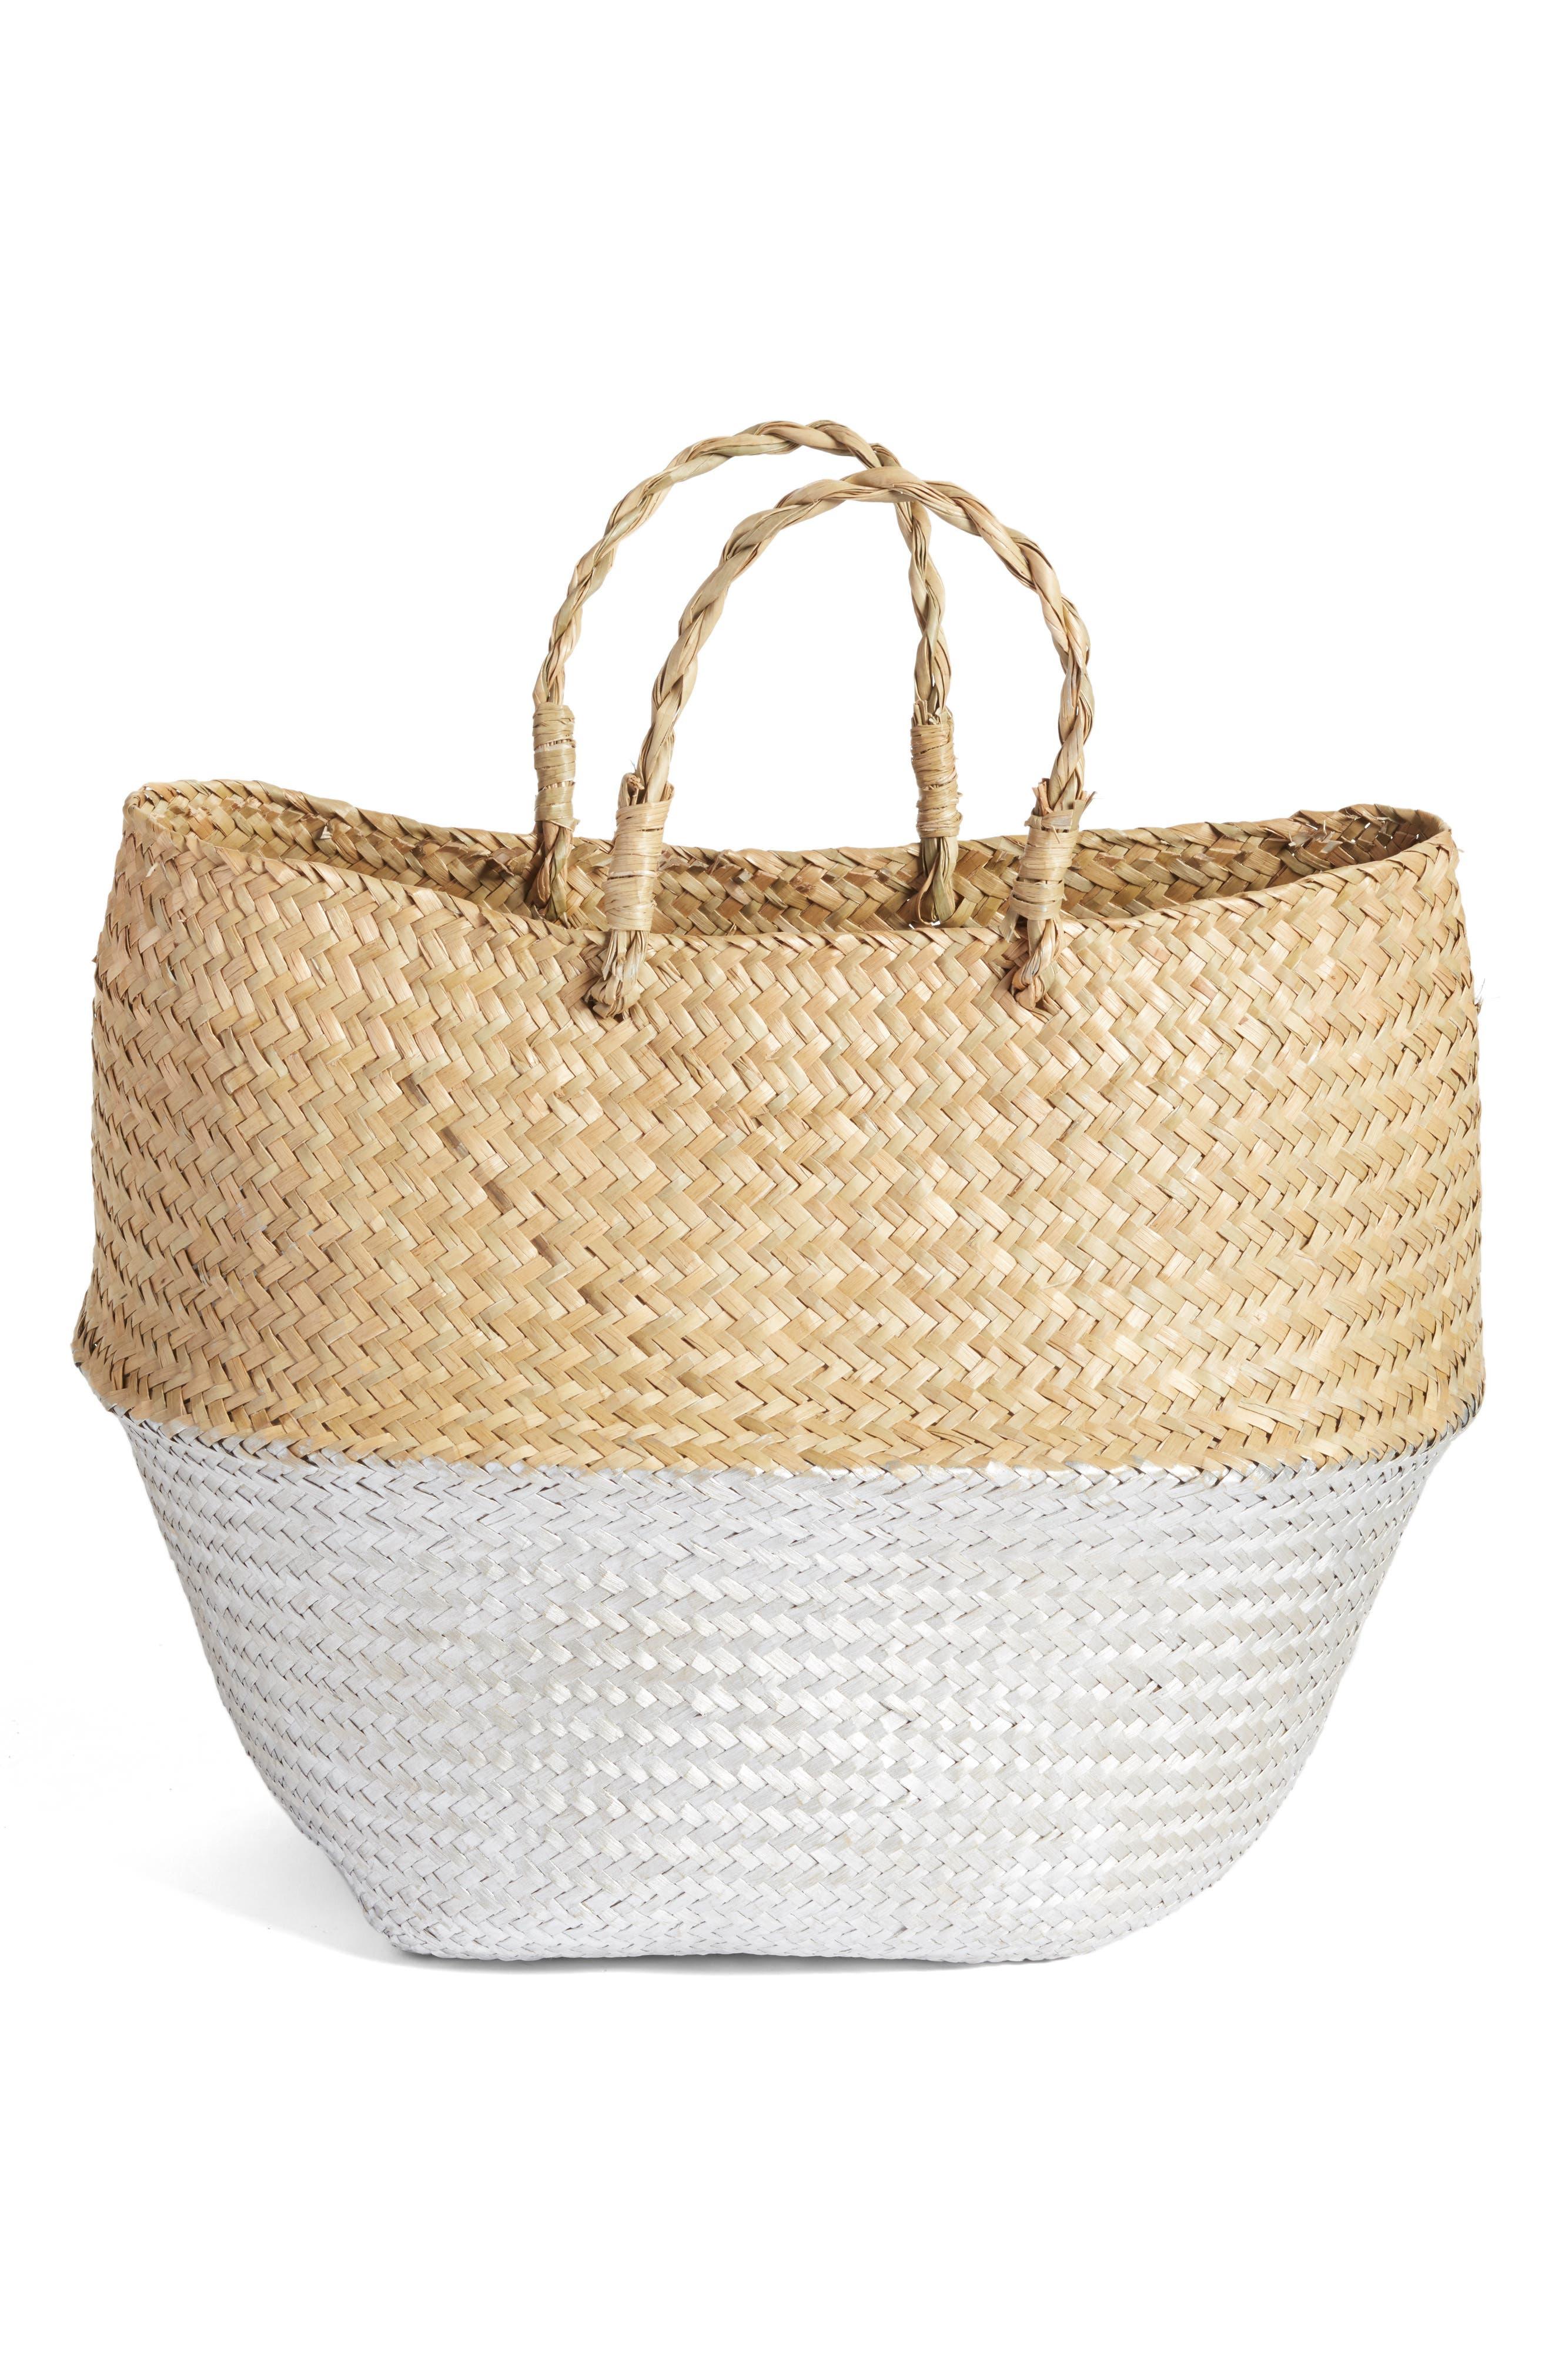 Levtex Two-Tone Metallic Straw Basket